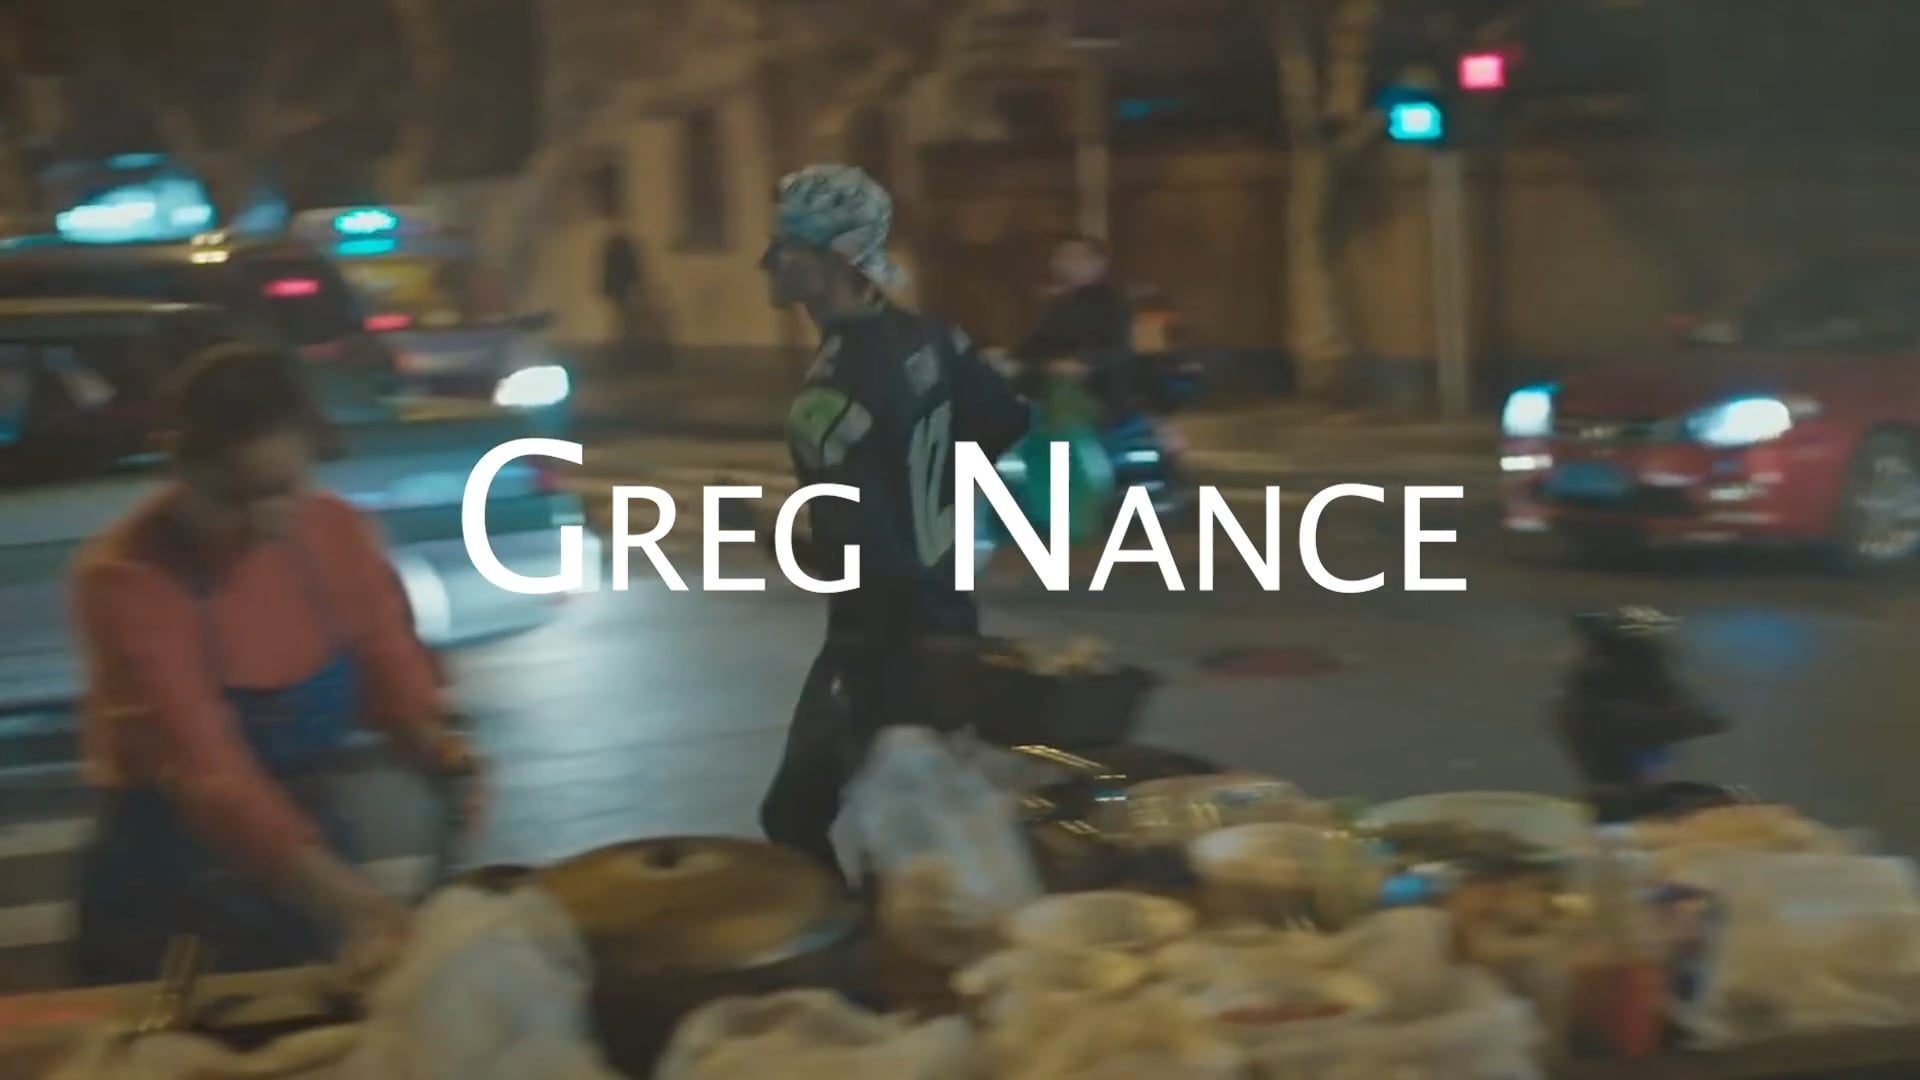 Greg Nance for Bainbridge Youth Services